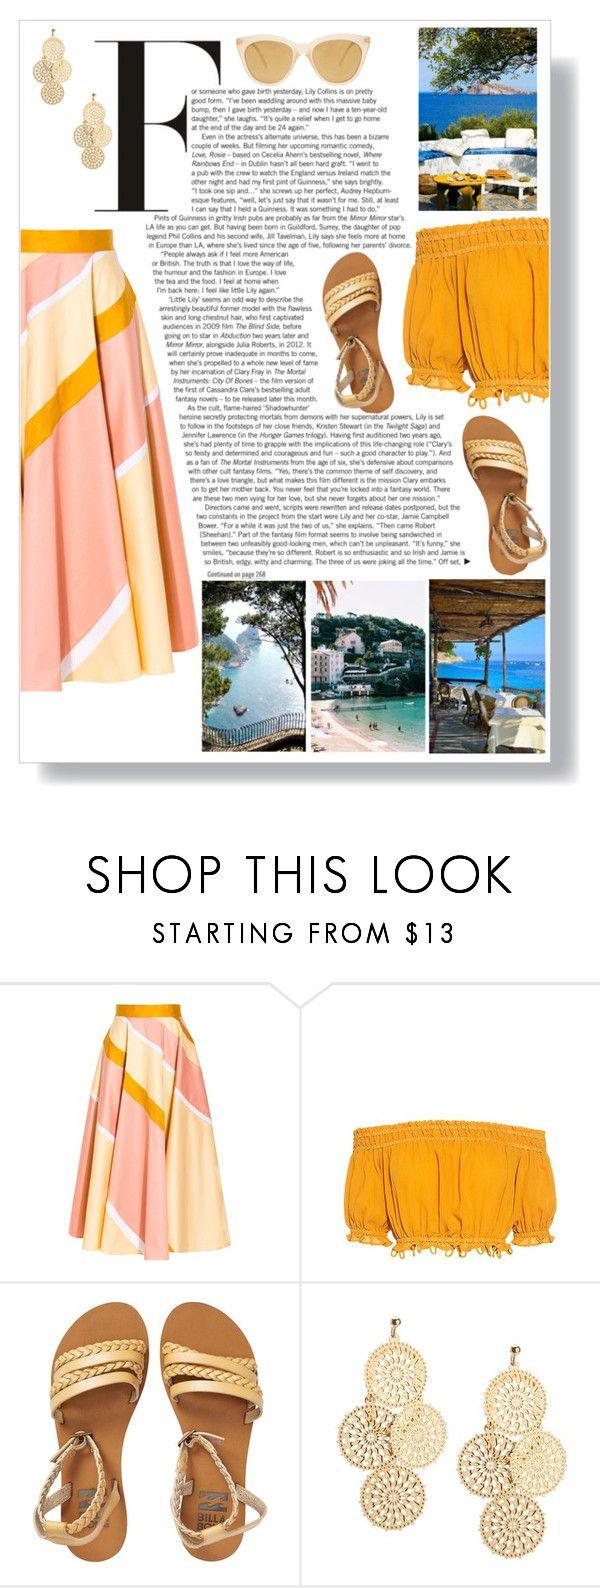 """Exploring Italian Islands"" by thefabulousfashionblog ❤ liked on Polyvore featuring Roksanda, Apiece Apart, Billabong, Le Specs, Summer, beach, summerstyle, summerfashion and summer2017"